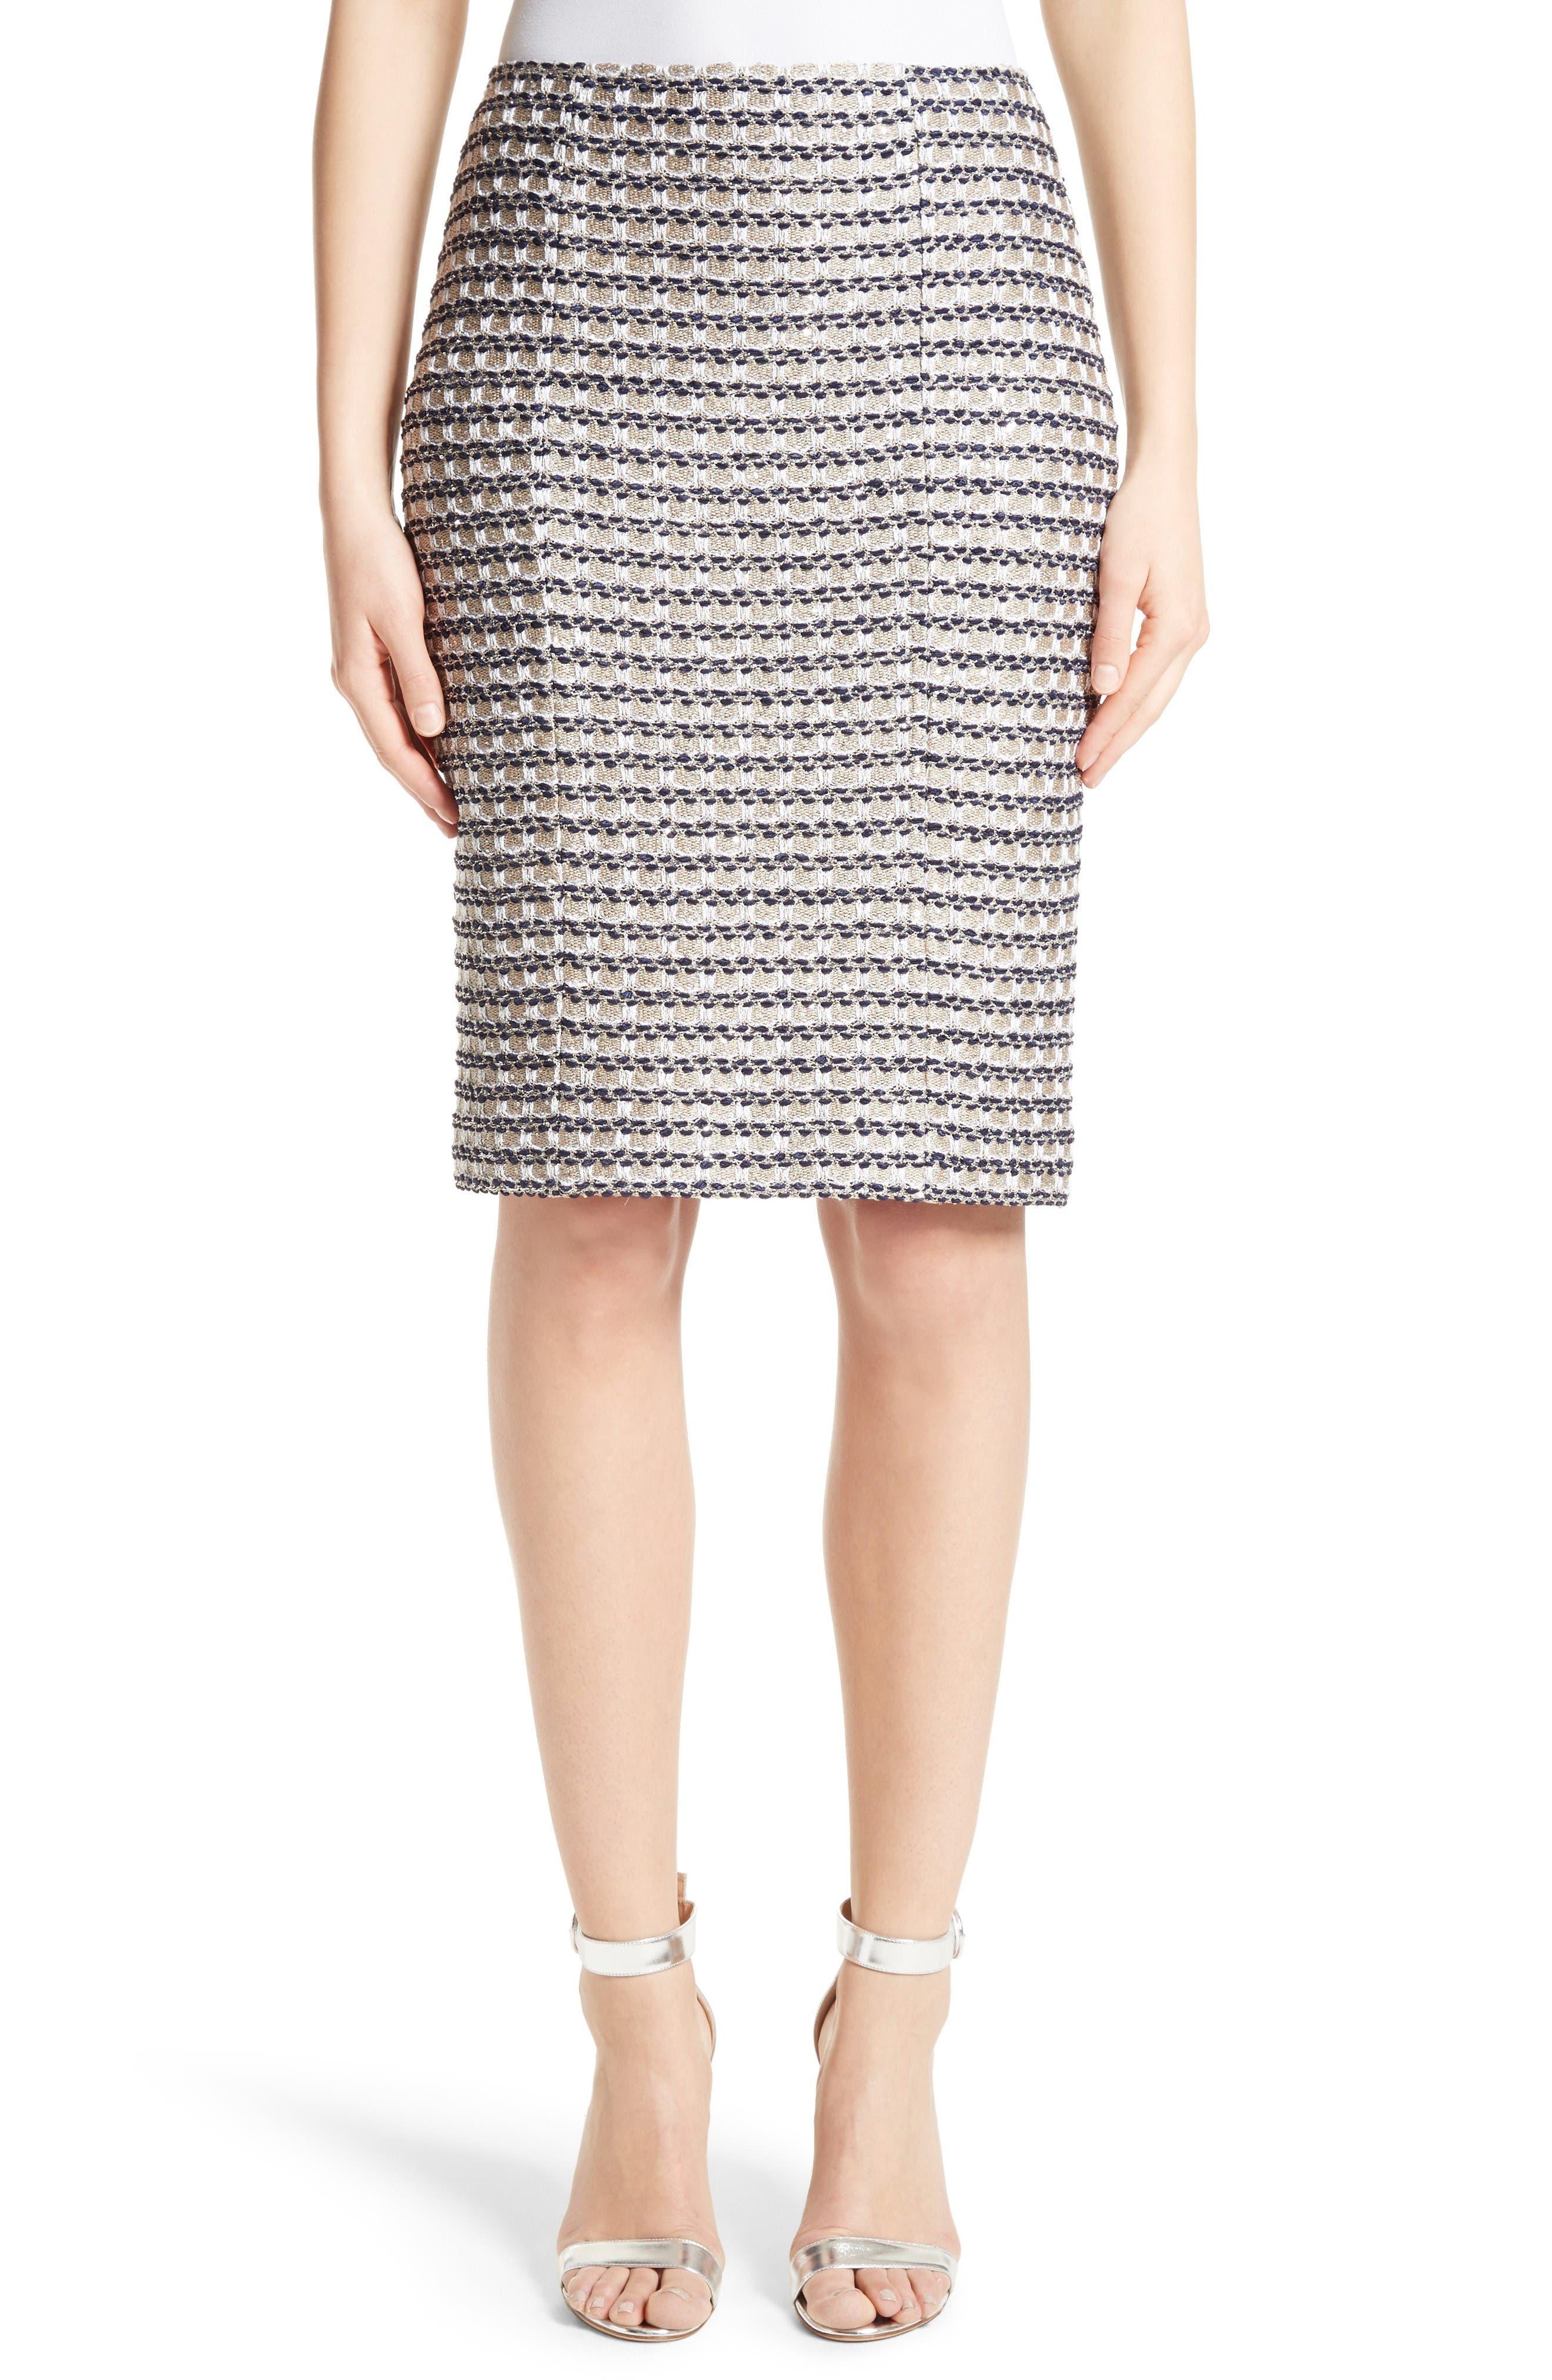 Main Image - St. John Collection Vany Tweed Knit Pencil Skirt